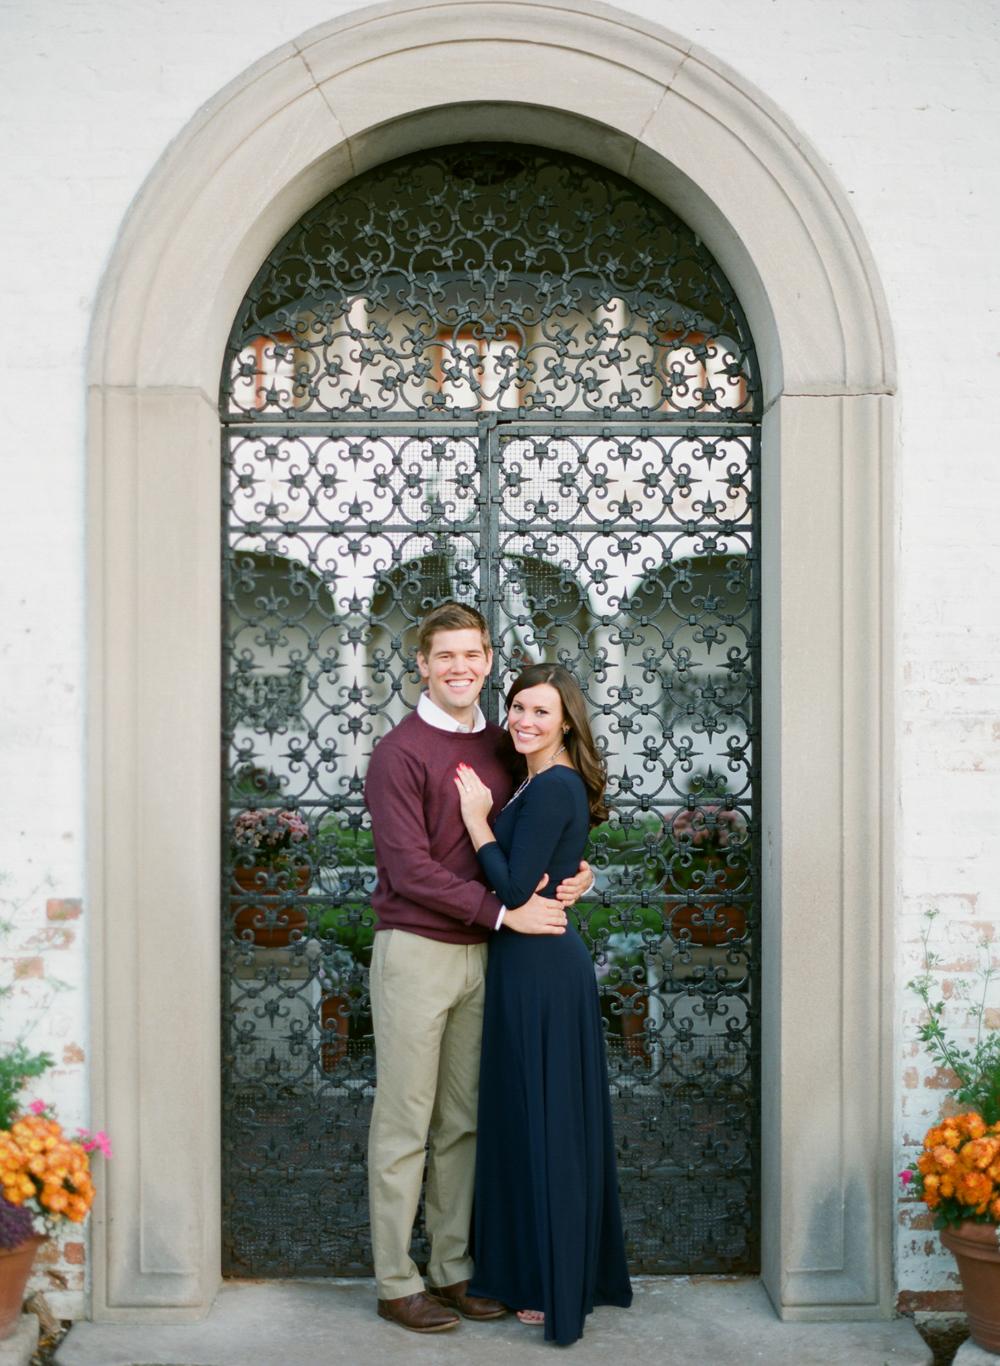 Villa_Terrace_Milwaukee_Engagement_Photographers_020.jpg